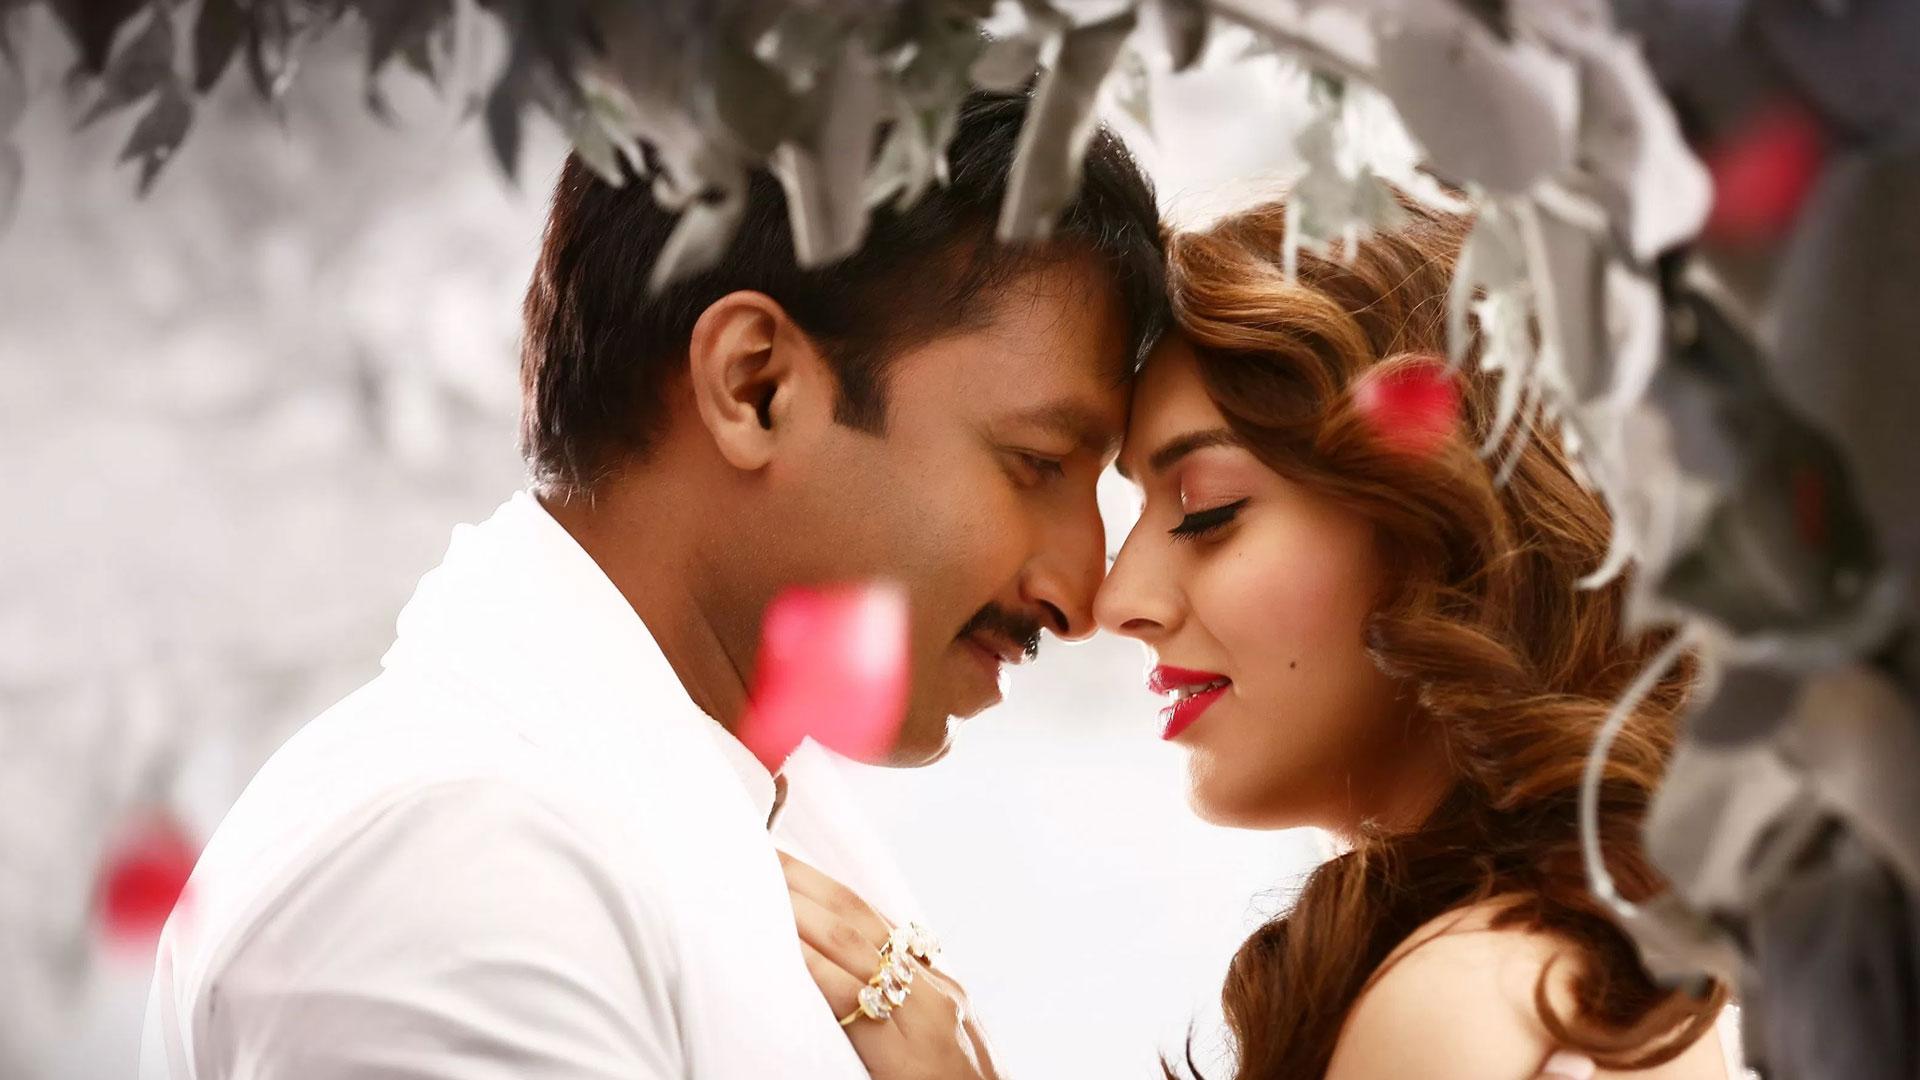 Goutham Nanda Full Movie Online Watch Goutham Nanda in Full HD Quality